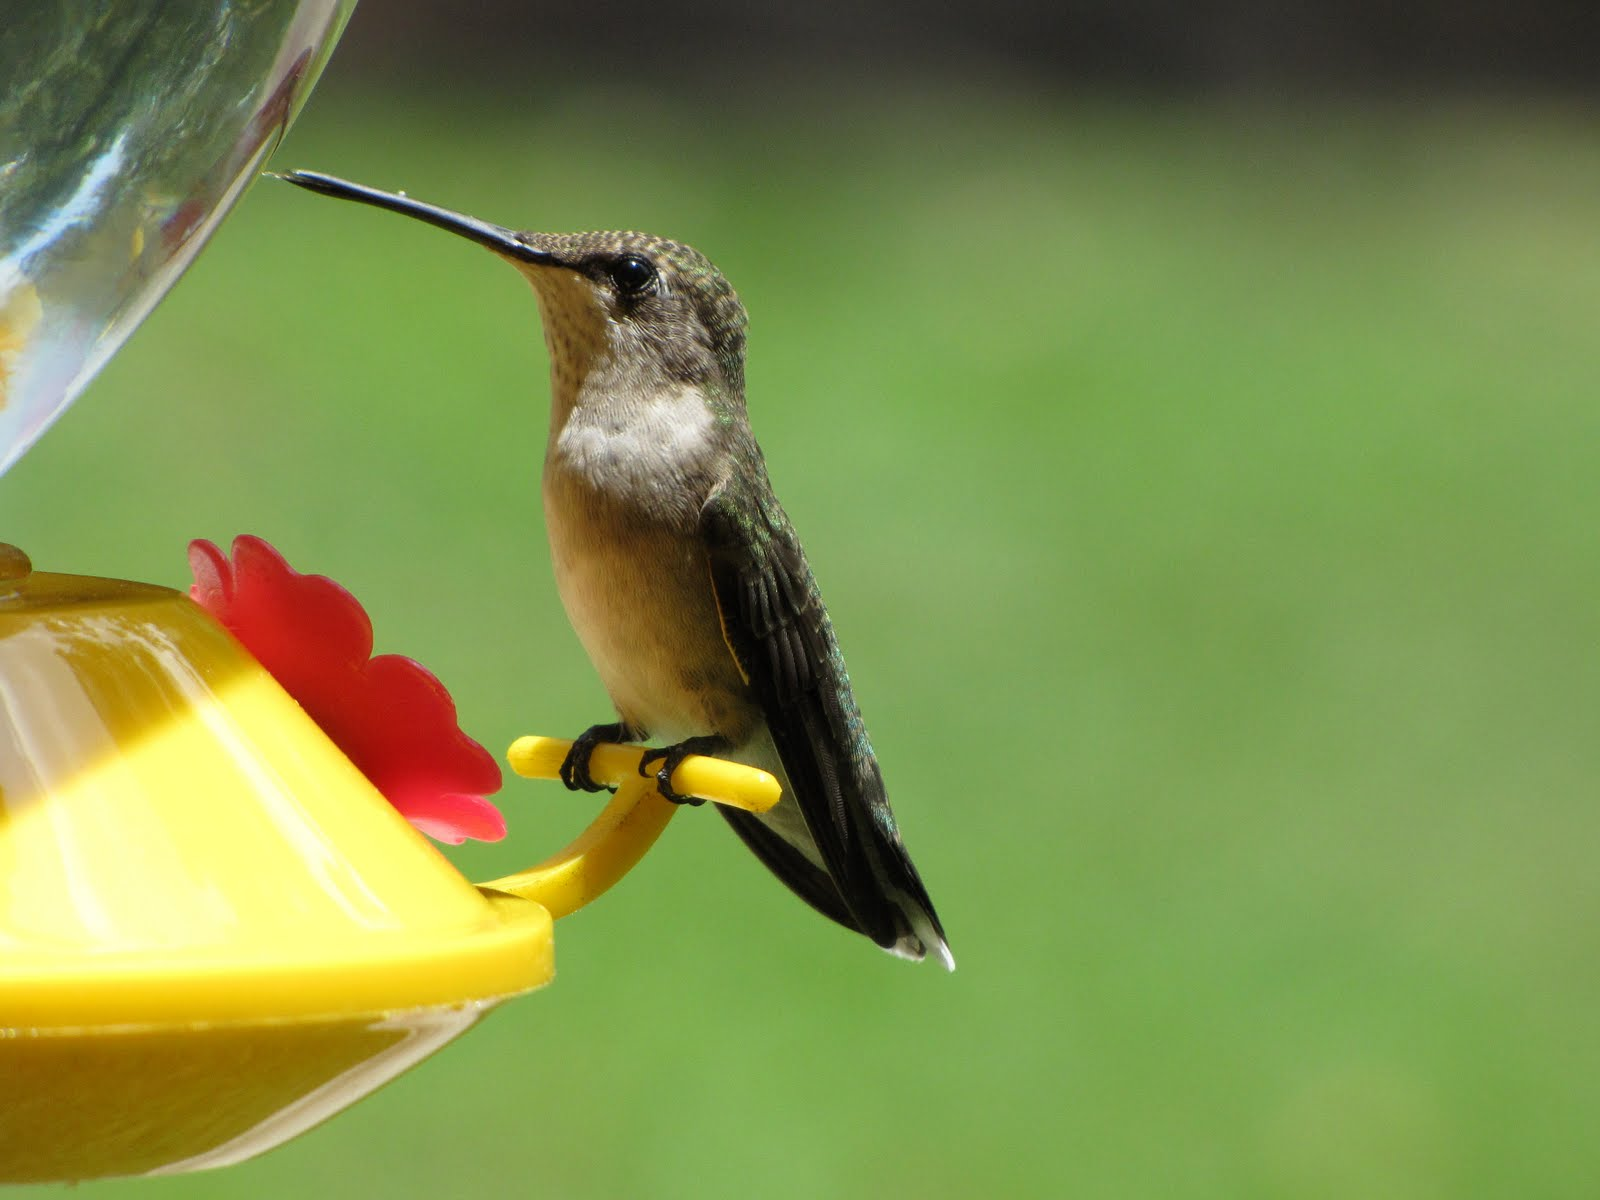 Sheris Healing Flower Garden: July's new baby hummingbirds!